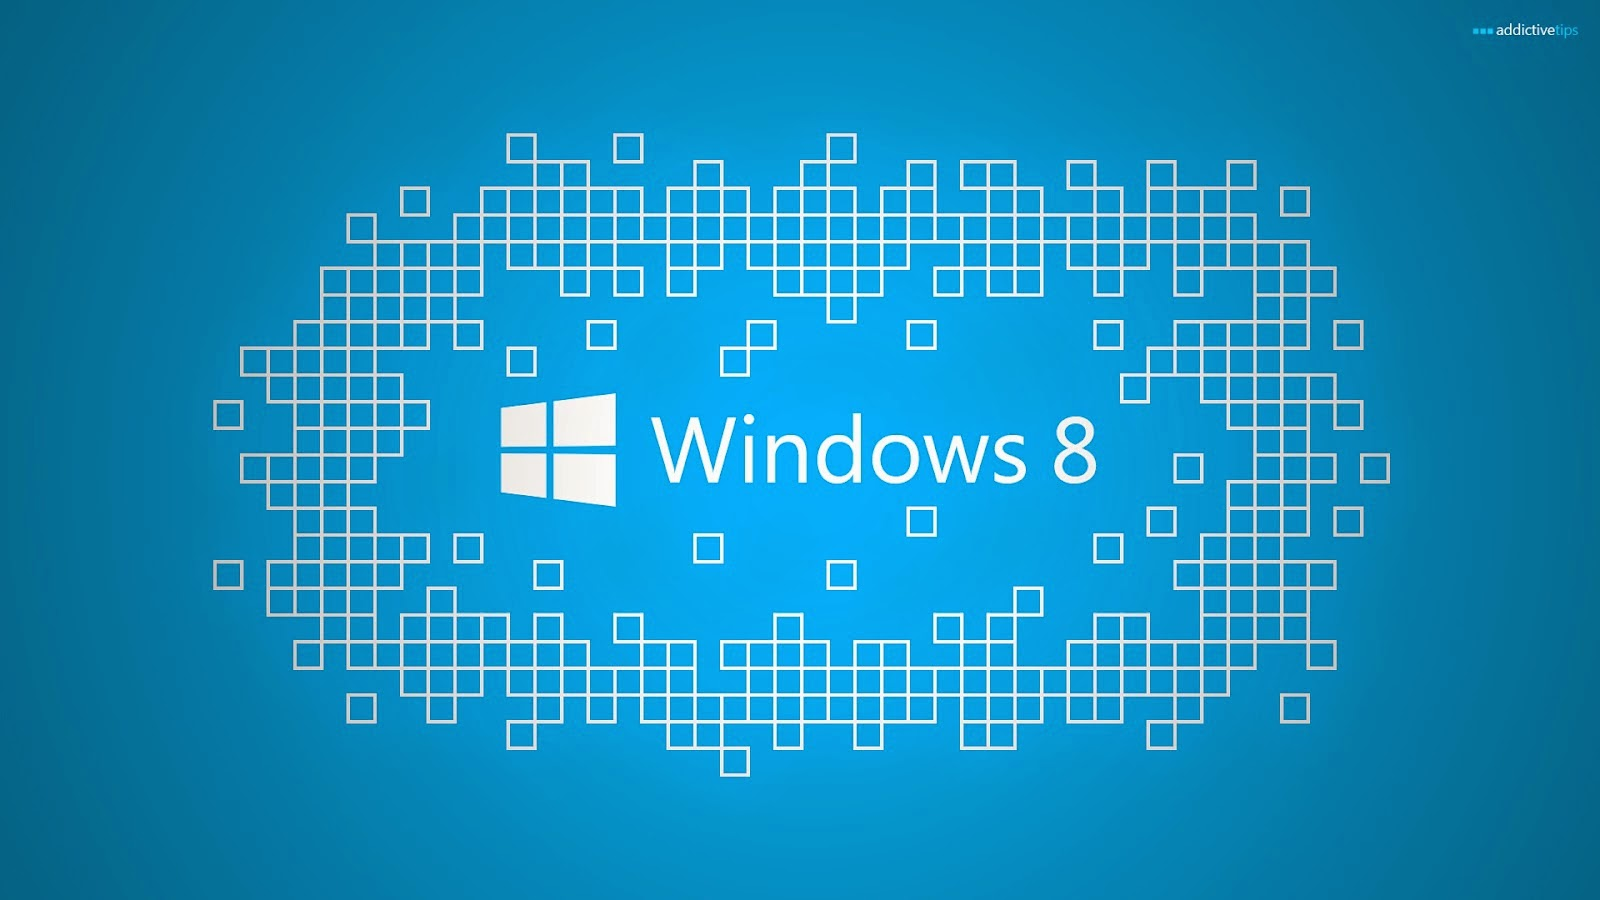 Download Kumpulan Wallpaper Windows 8 Terbaru Gratis Zain Elhasany